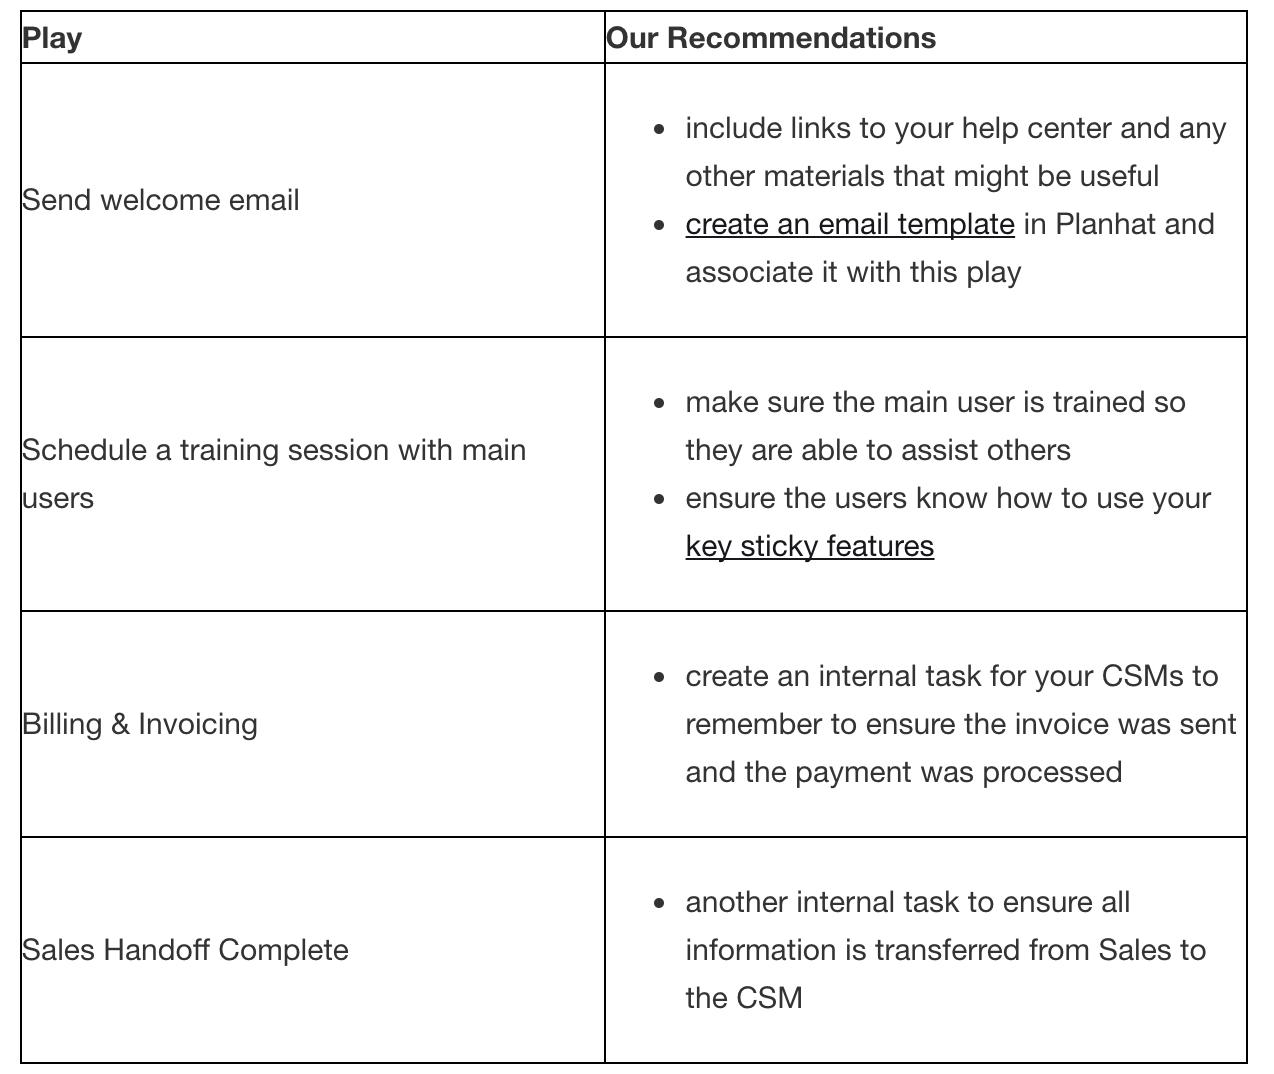 process playbook template choice image template design ideas. Black Bedroom Furniture Sets. Home Design Ideas